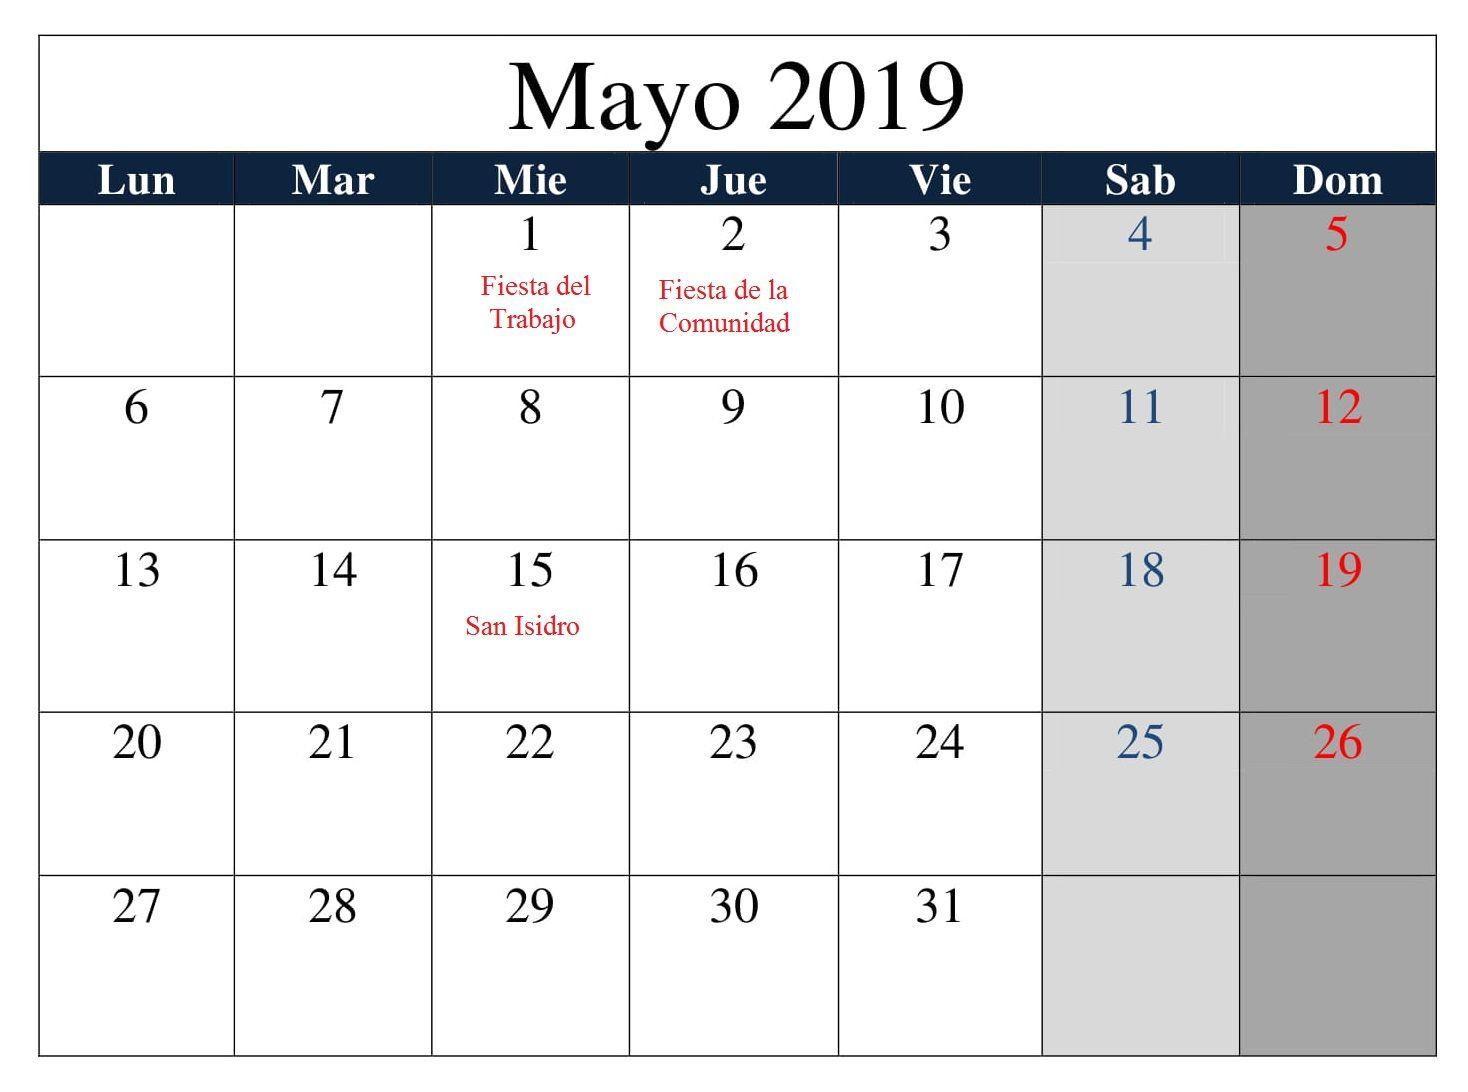 Calendario Con Excel.Mayo Calendario 2019 Con Festivos Excel Calendario Mayo